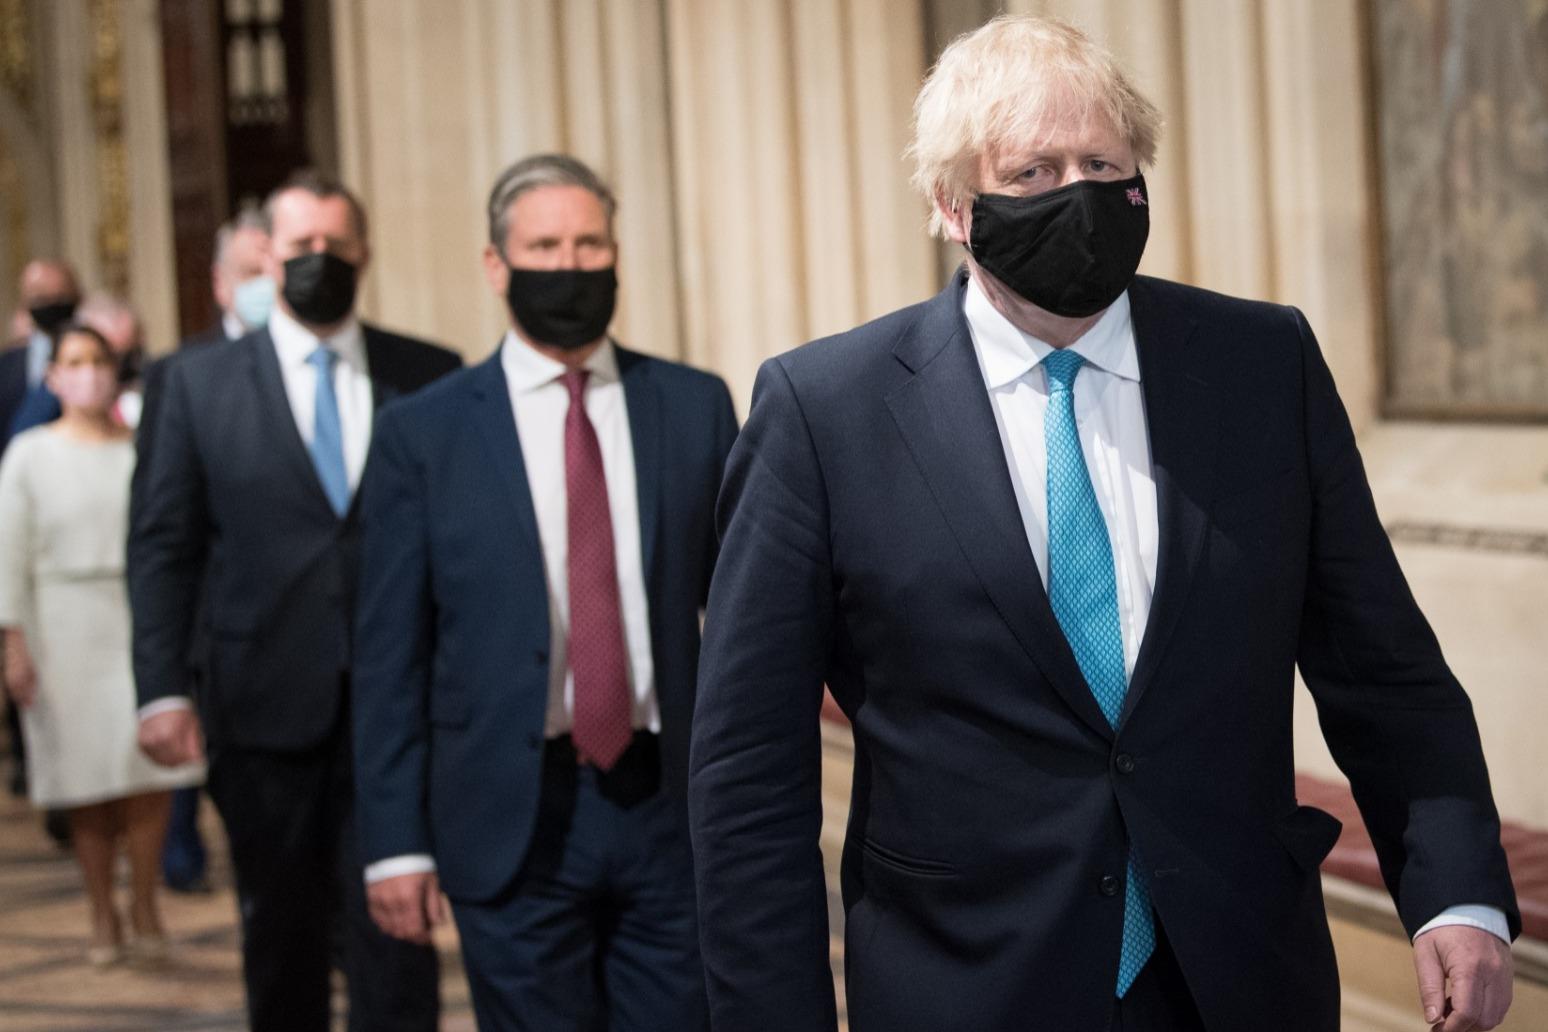 Boris Johnson and Keir Starmer praise global resolve on 20th anniversary of 9/11